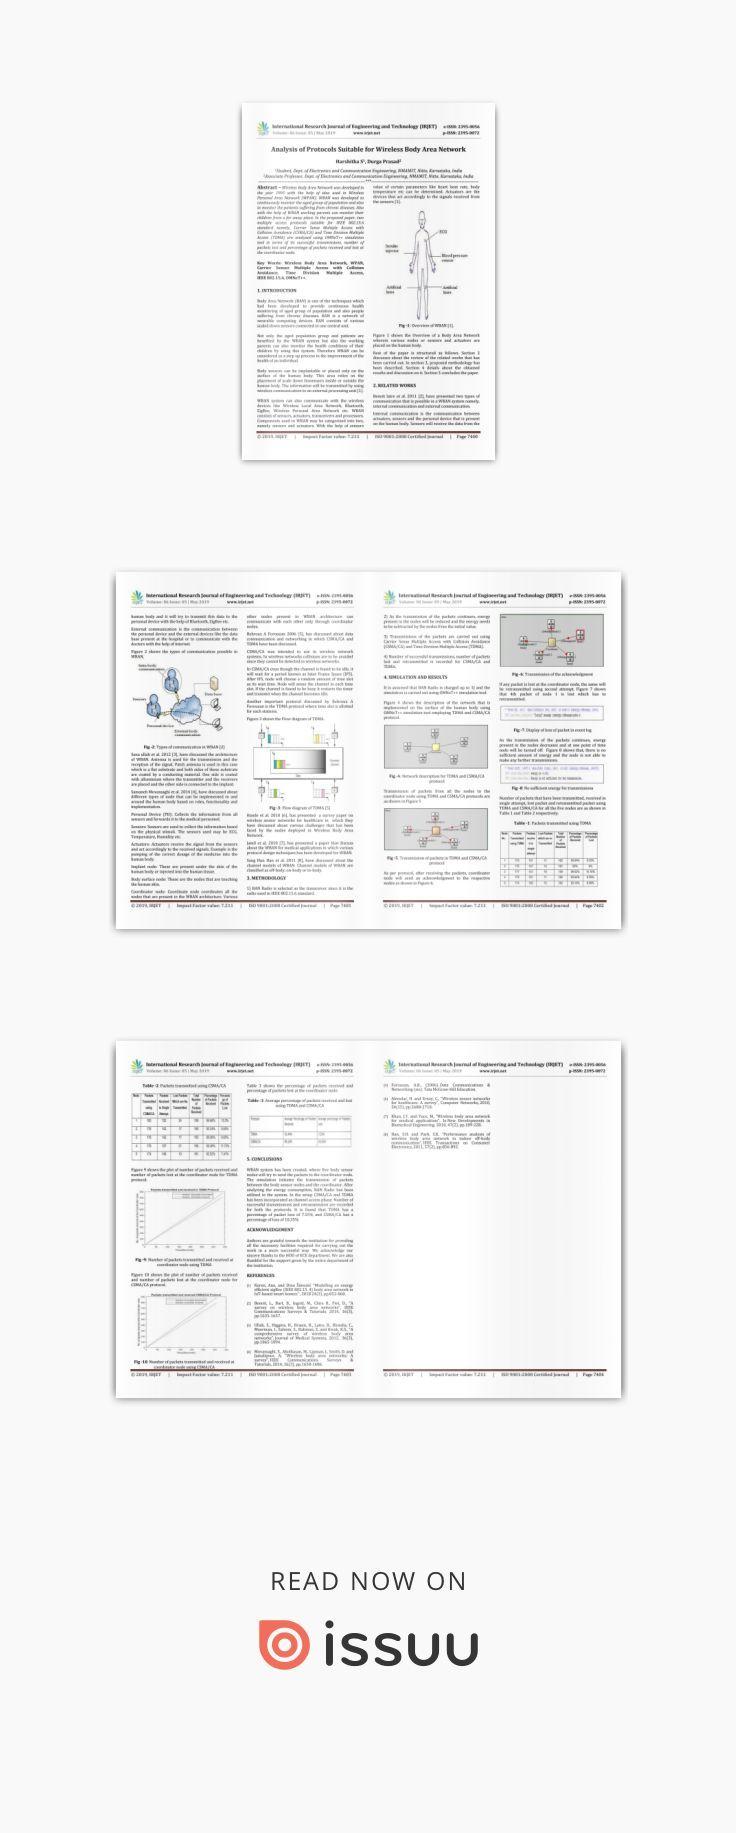 Irjet analysis of protocols suitable for wireless body